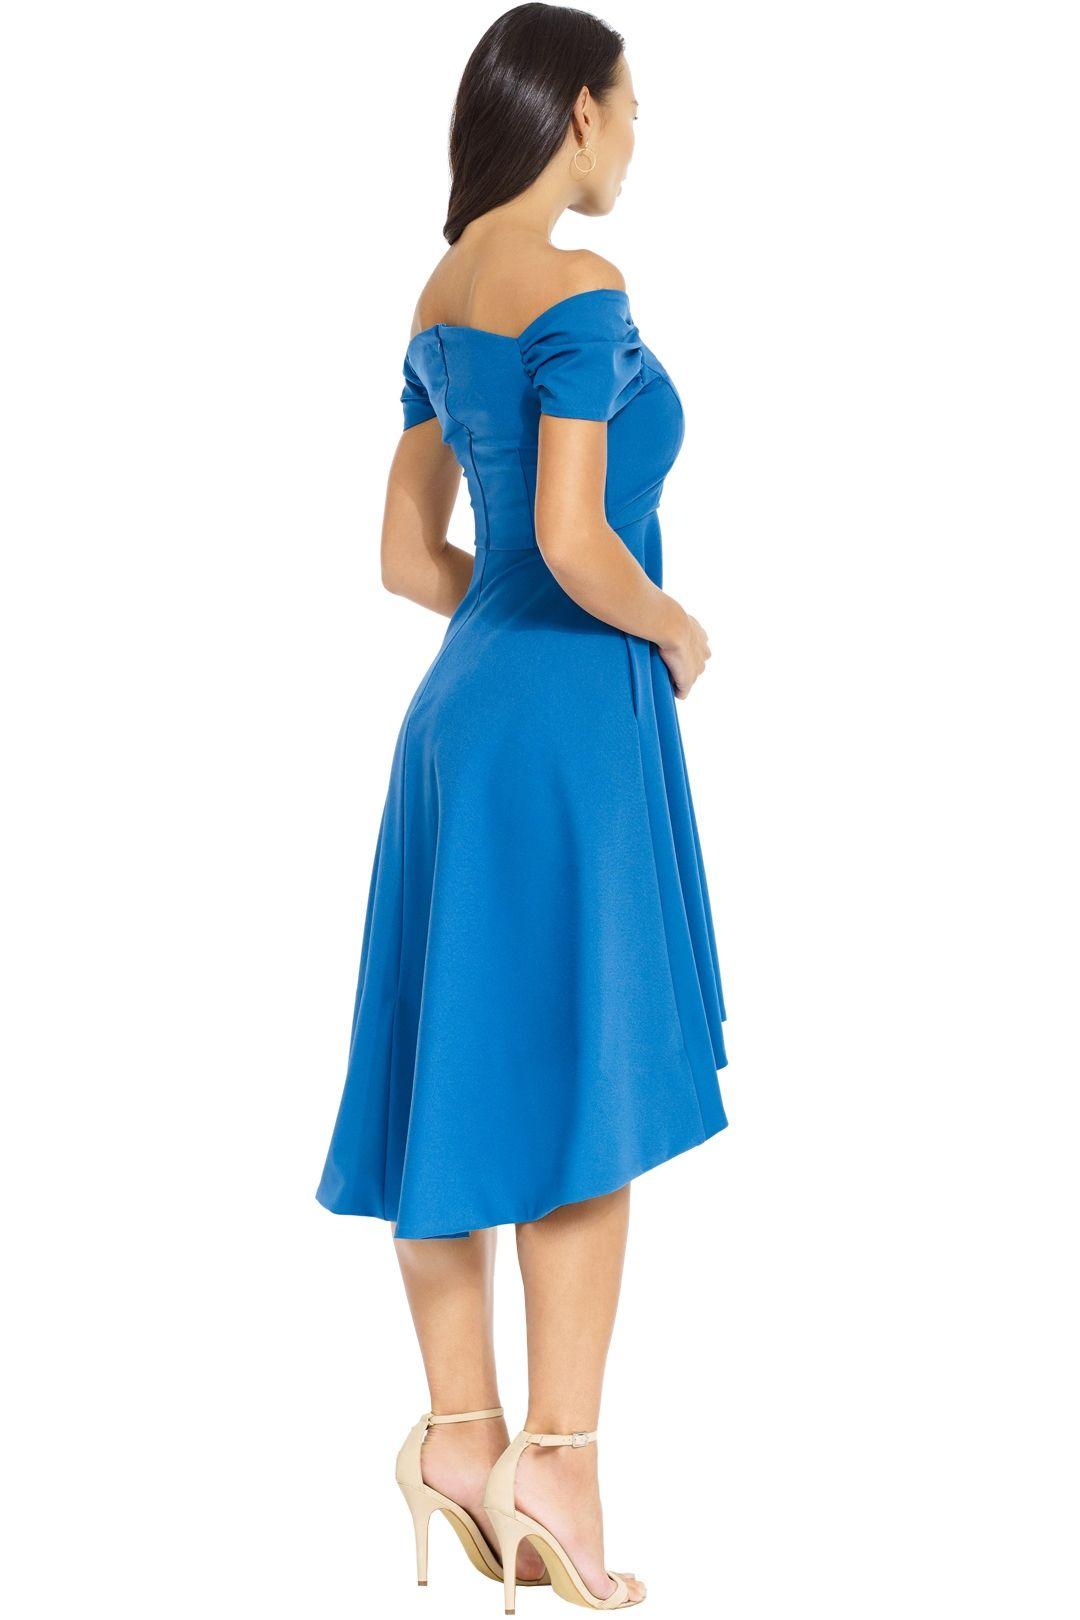 Elliatt - Palace Dress - Blue - Back